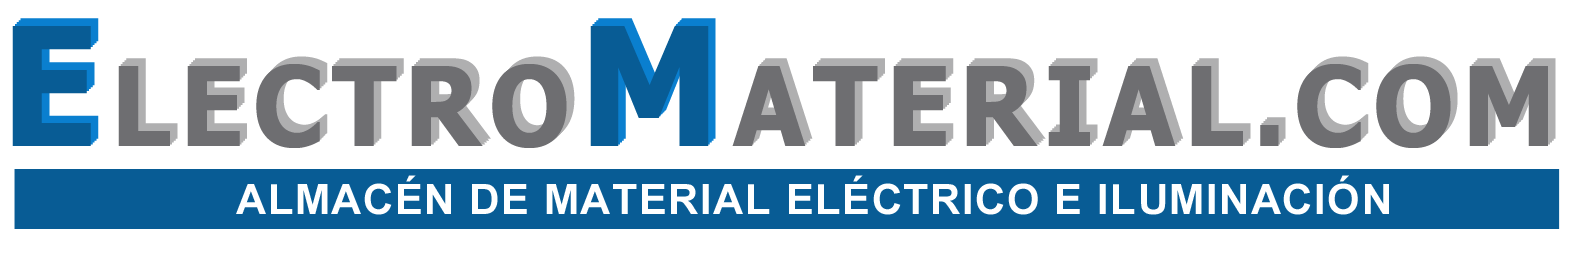 electromaterial.com